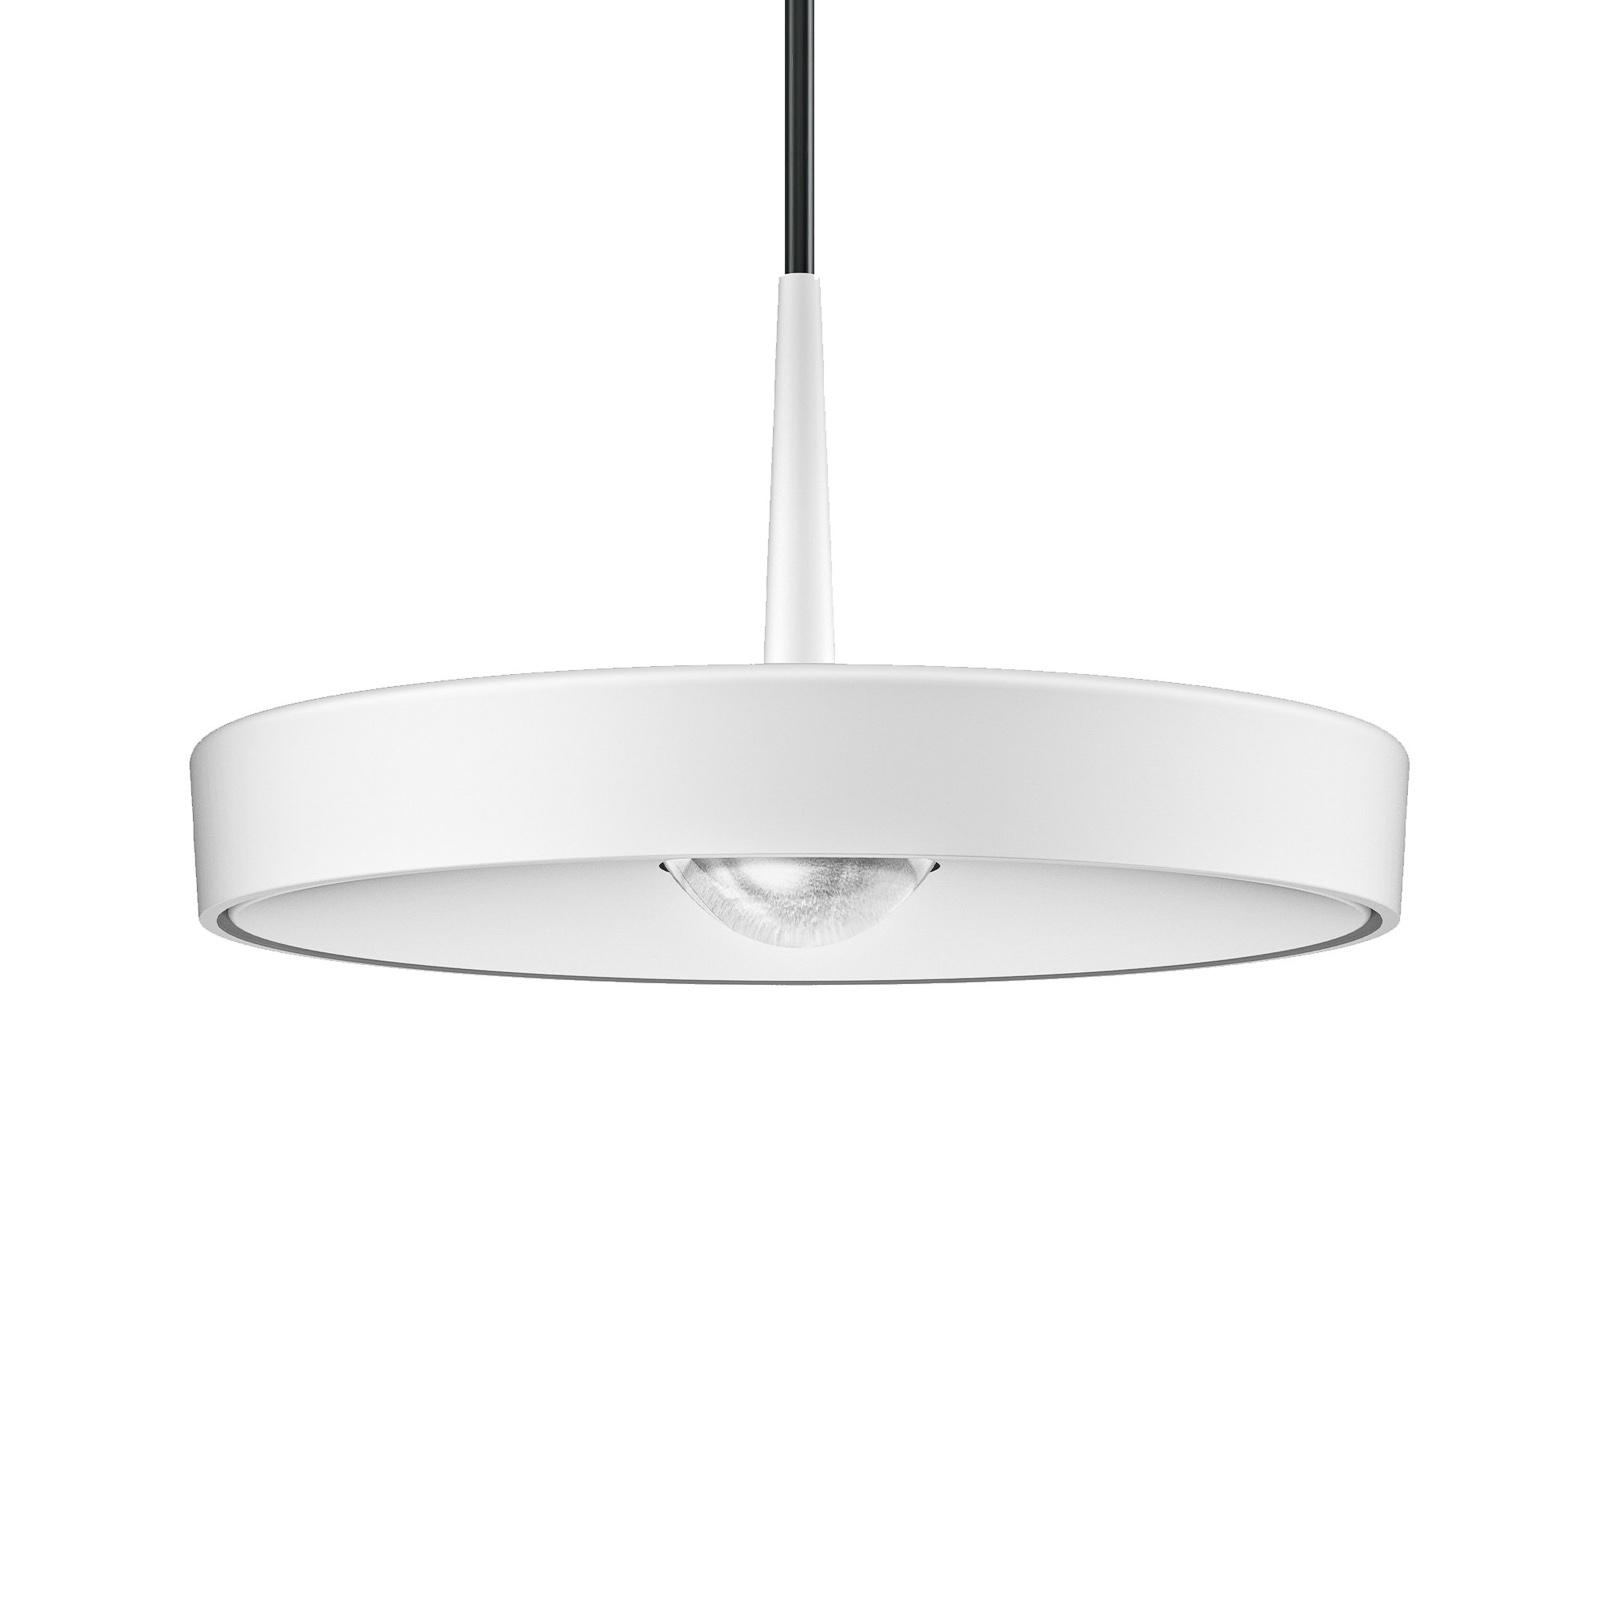 Ribag Kivo LED-Pendel Ein/Aus 27cm 2.700K weiß